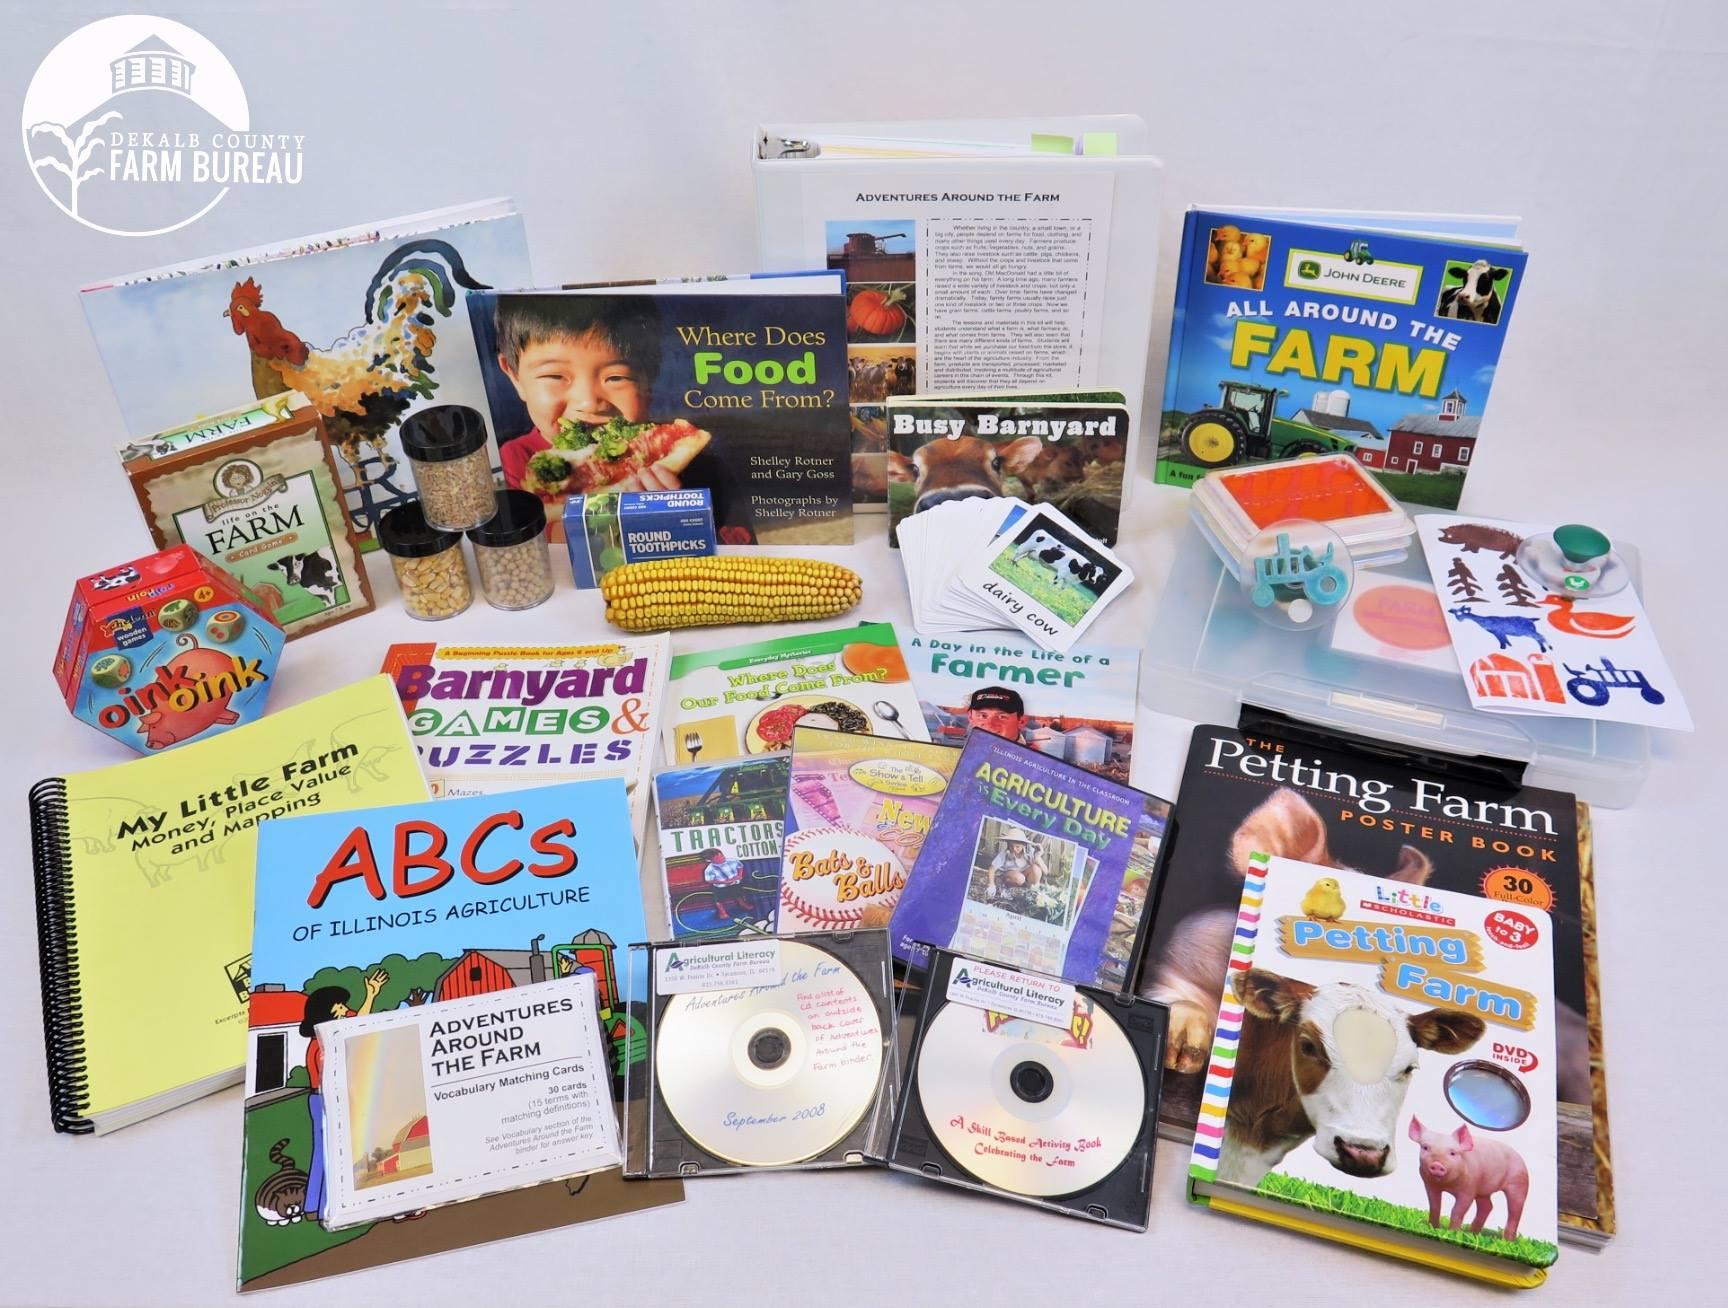 DeKalb County Farm Bureau has dozens of educational kits like this